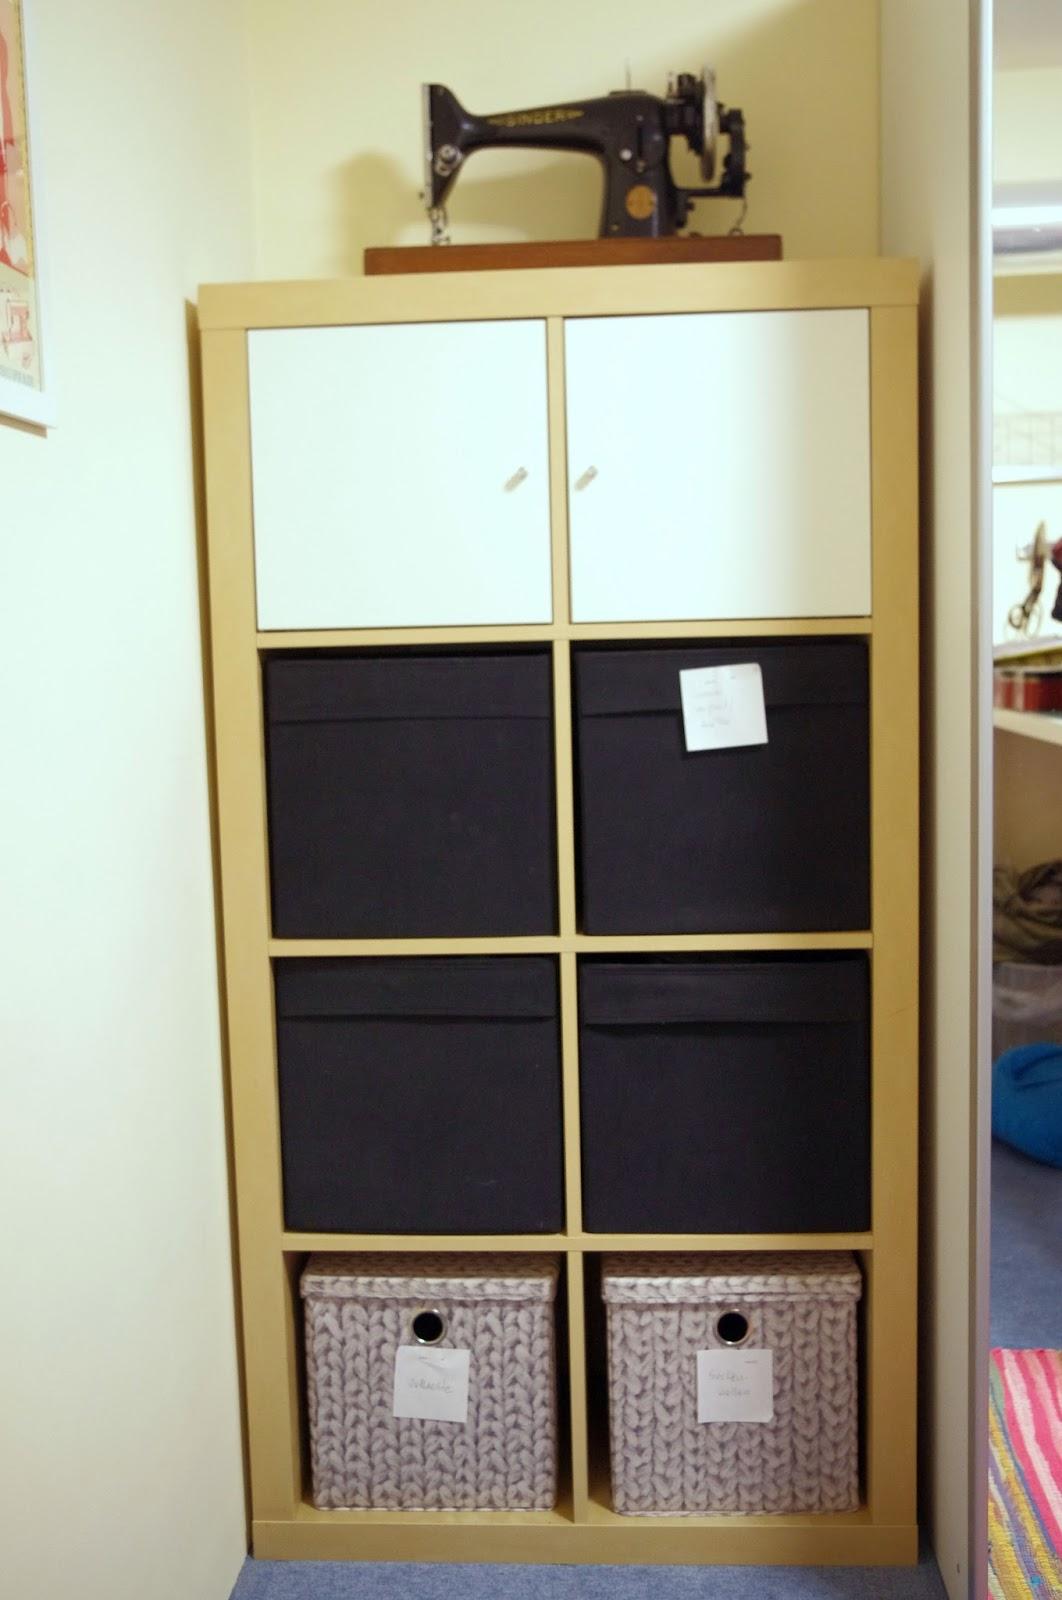 kape anlumi wolldi t wolldi t. Black Bedroom Furniture Sets. Home Design Ideas